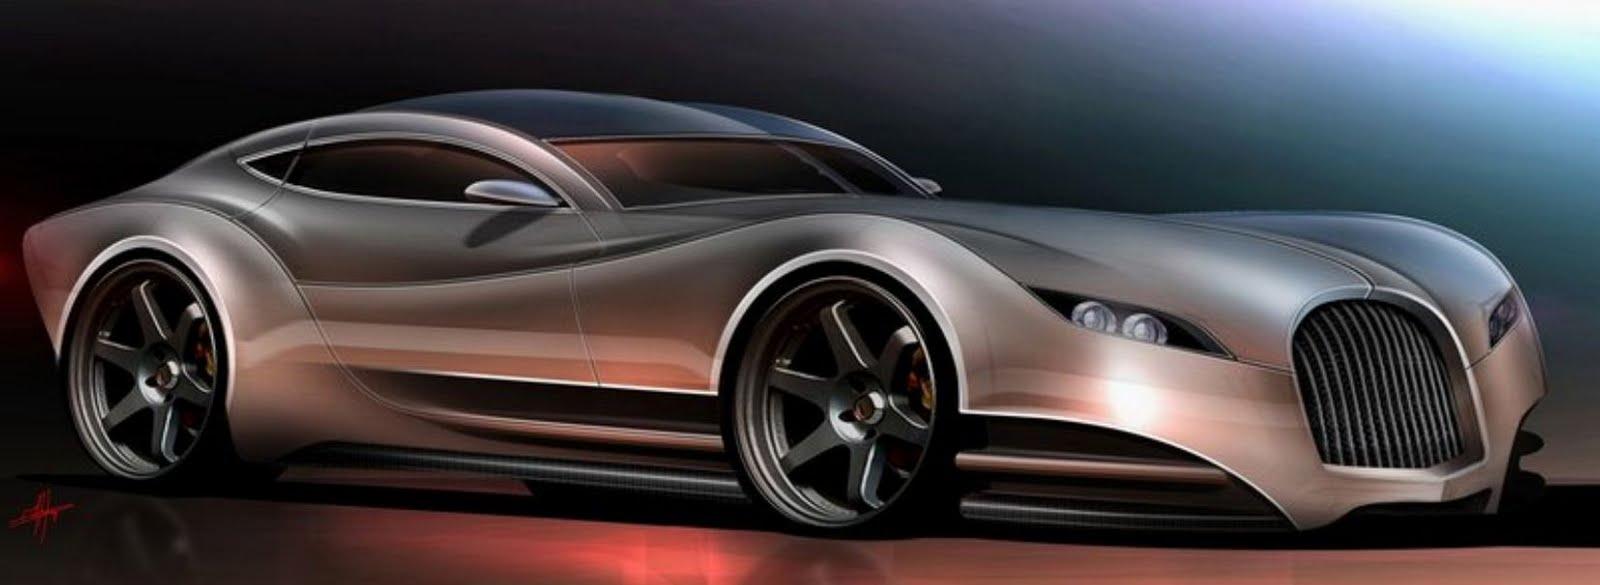 New Sports Cars Morgan EvaGT AUTOS CAR - New sports cars